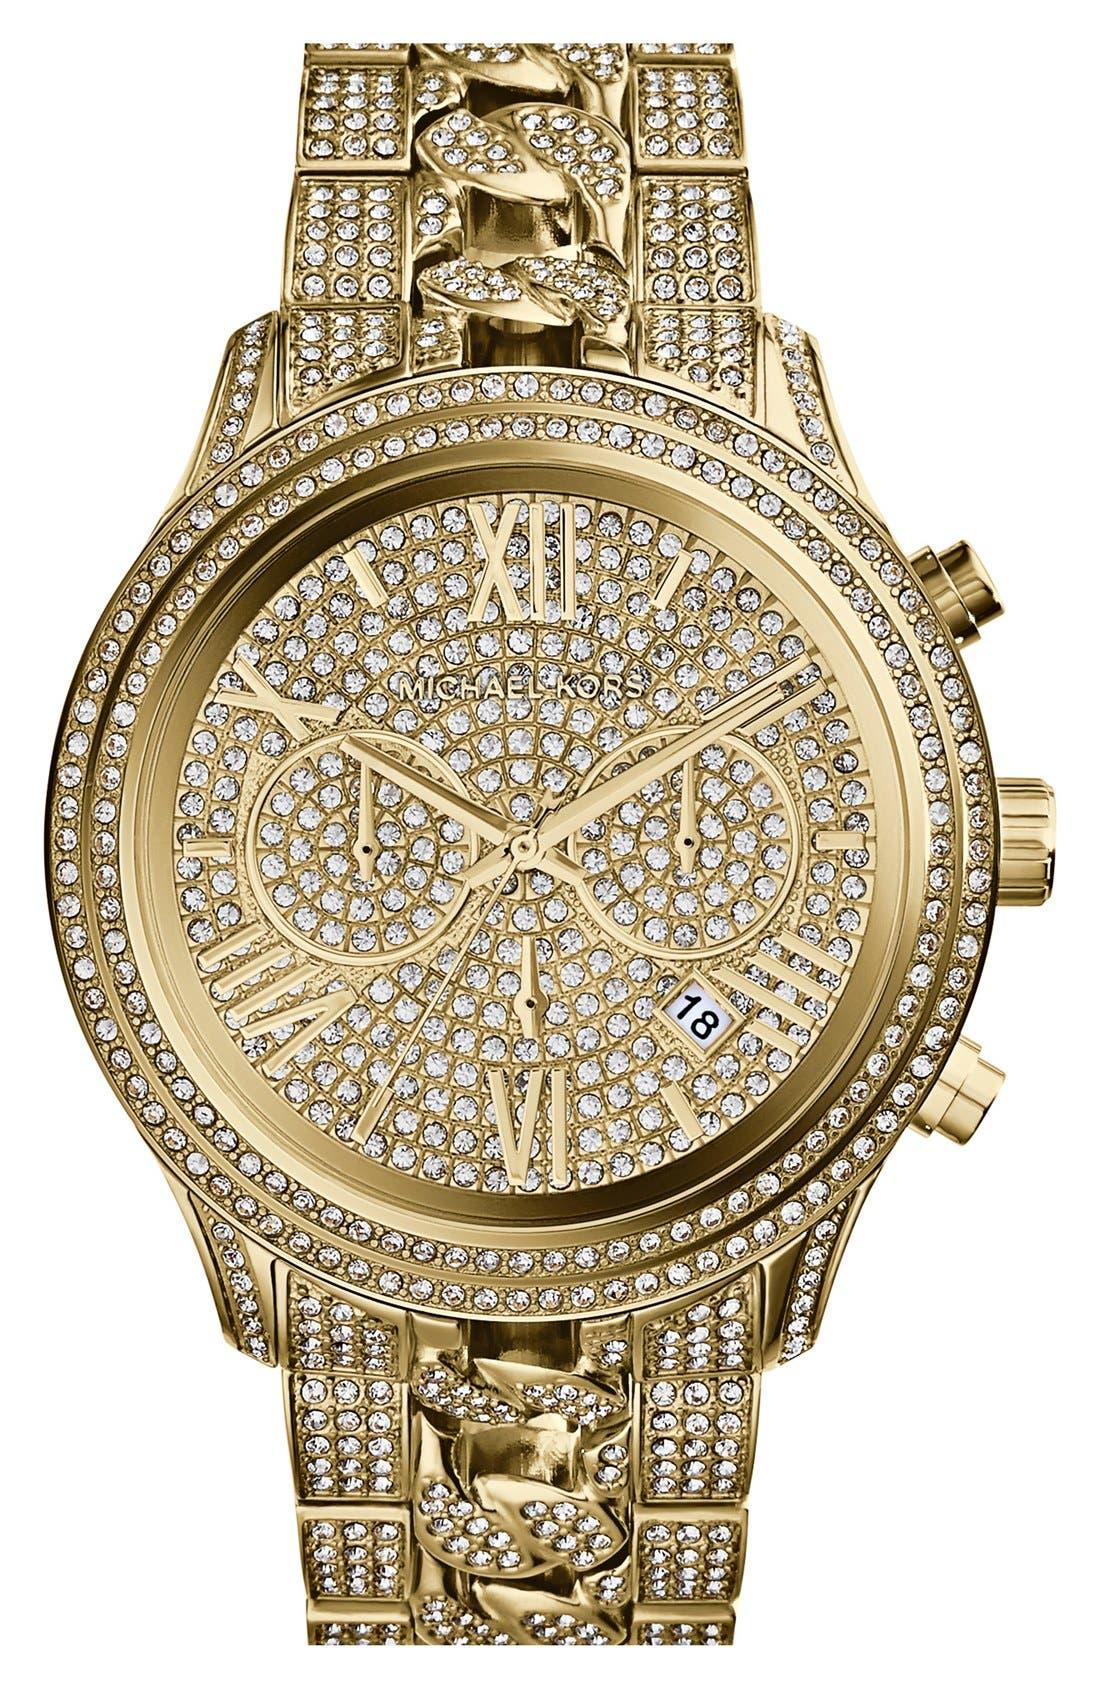 Main Image - Michael Kors 'Lindley' Pavé Chronograph Bracelet Watch, 48mm